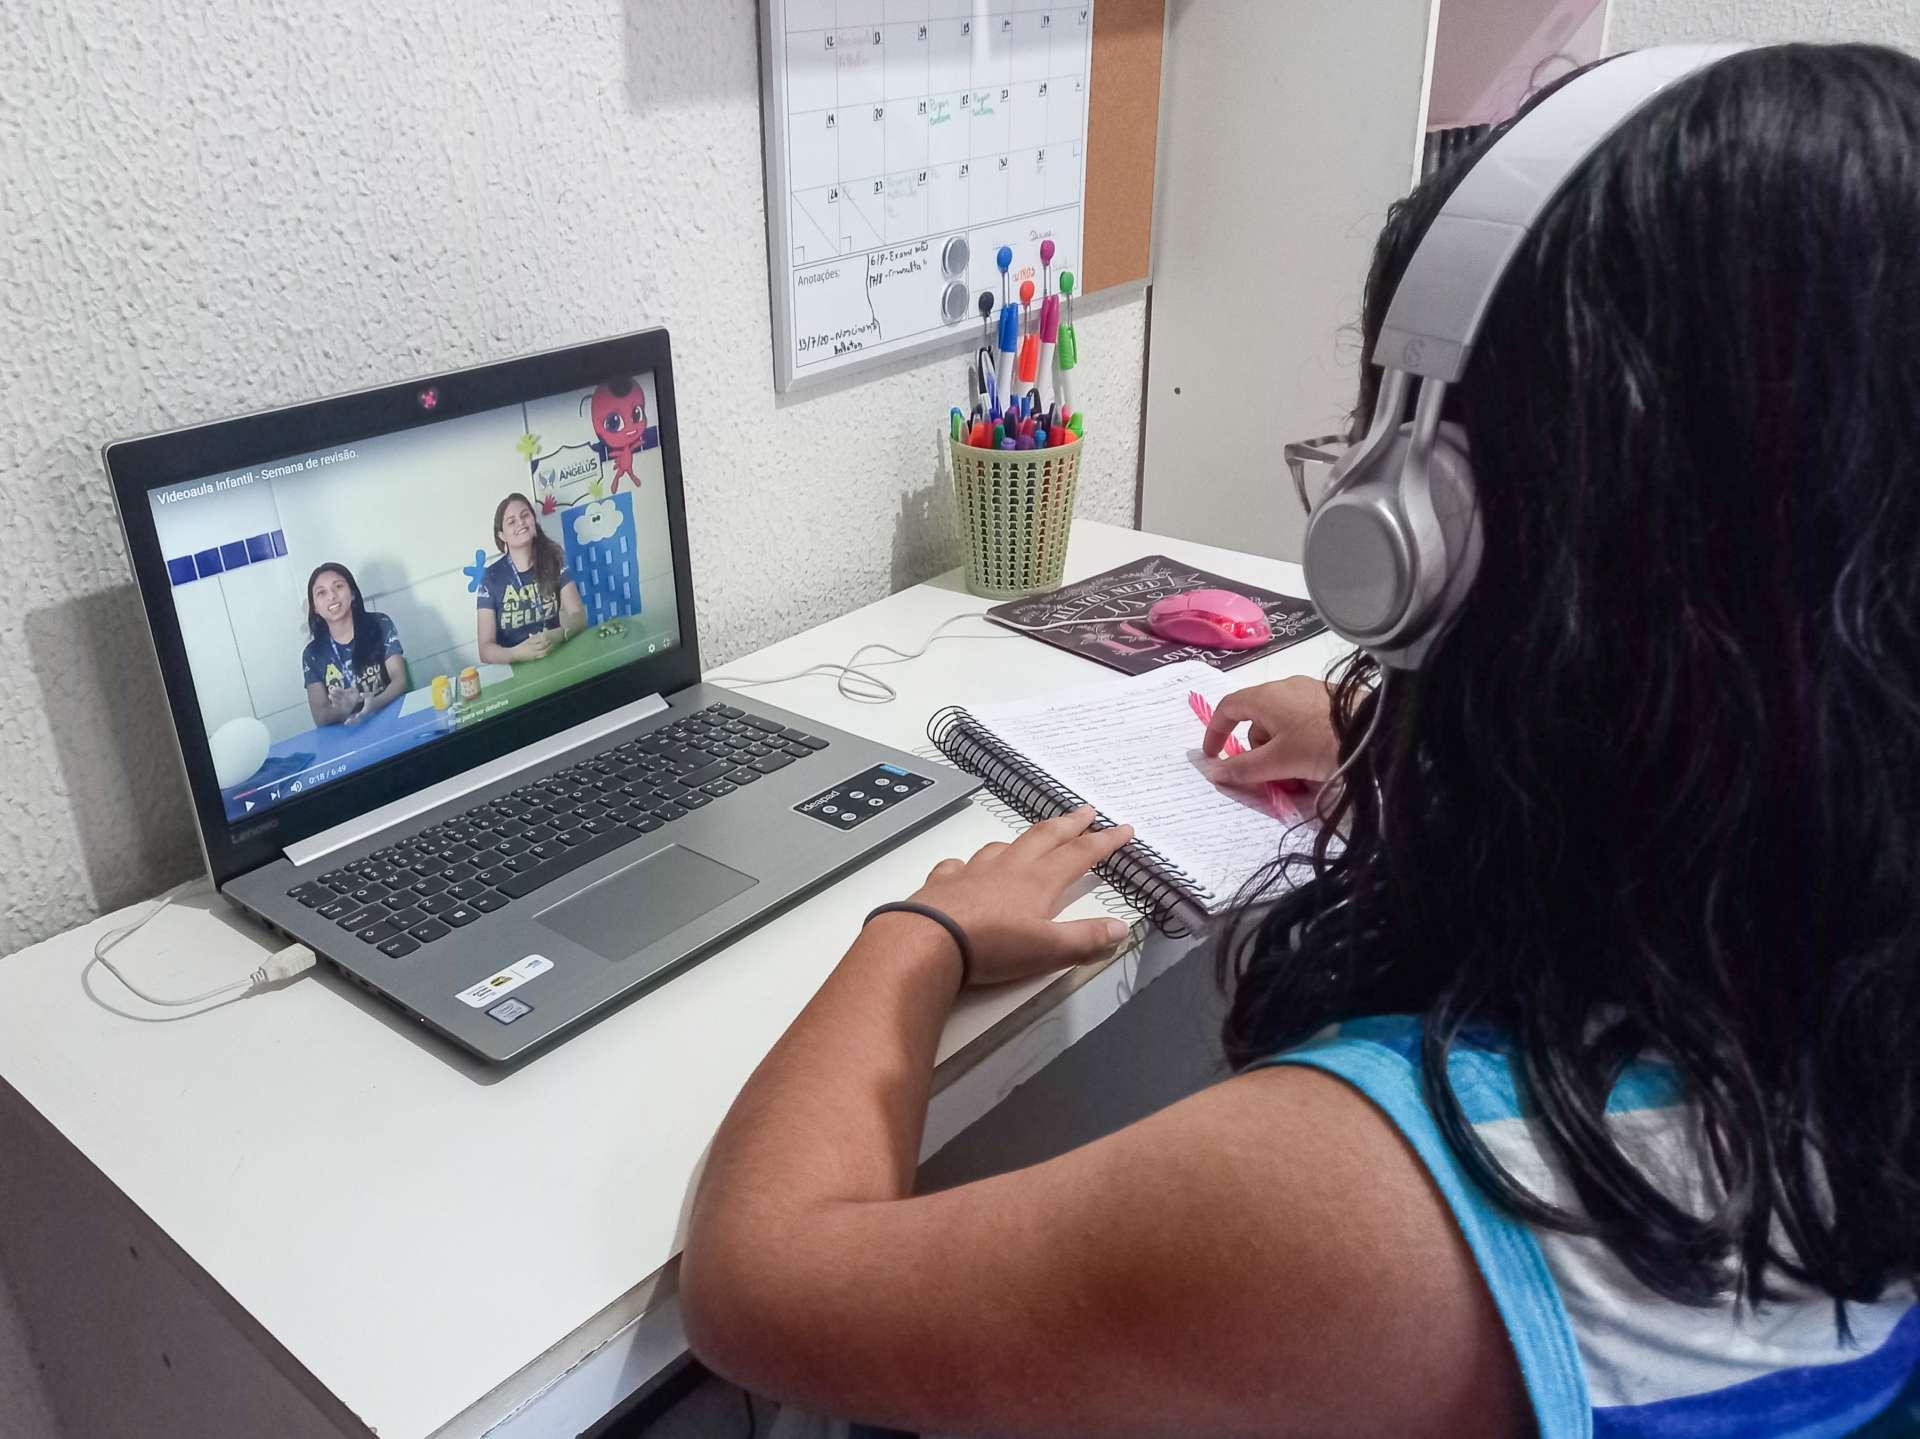 AULAS remotas: alternativa diante do isolamento social imposto pela pandemia do coronavírus (BARBARA MOIRA/ O POVO)